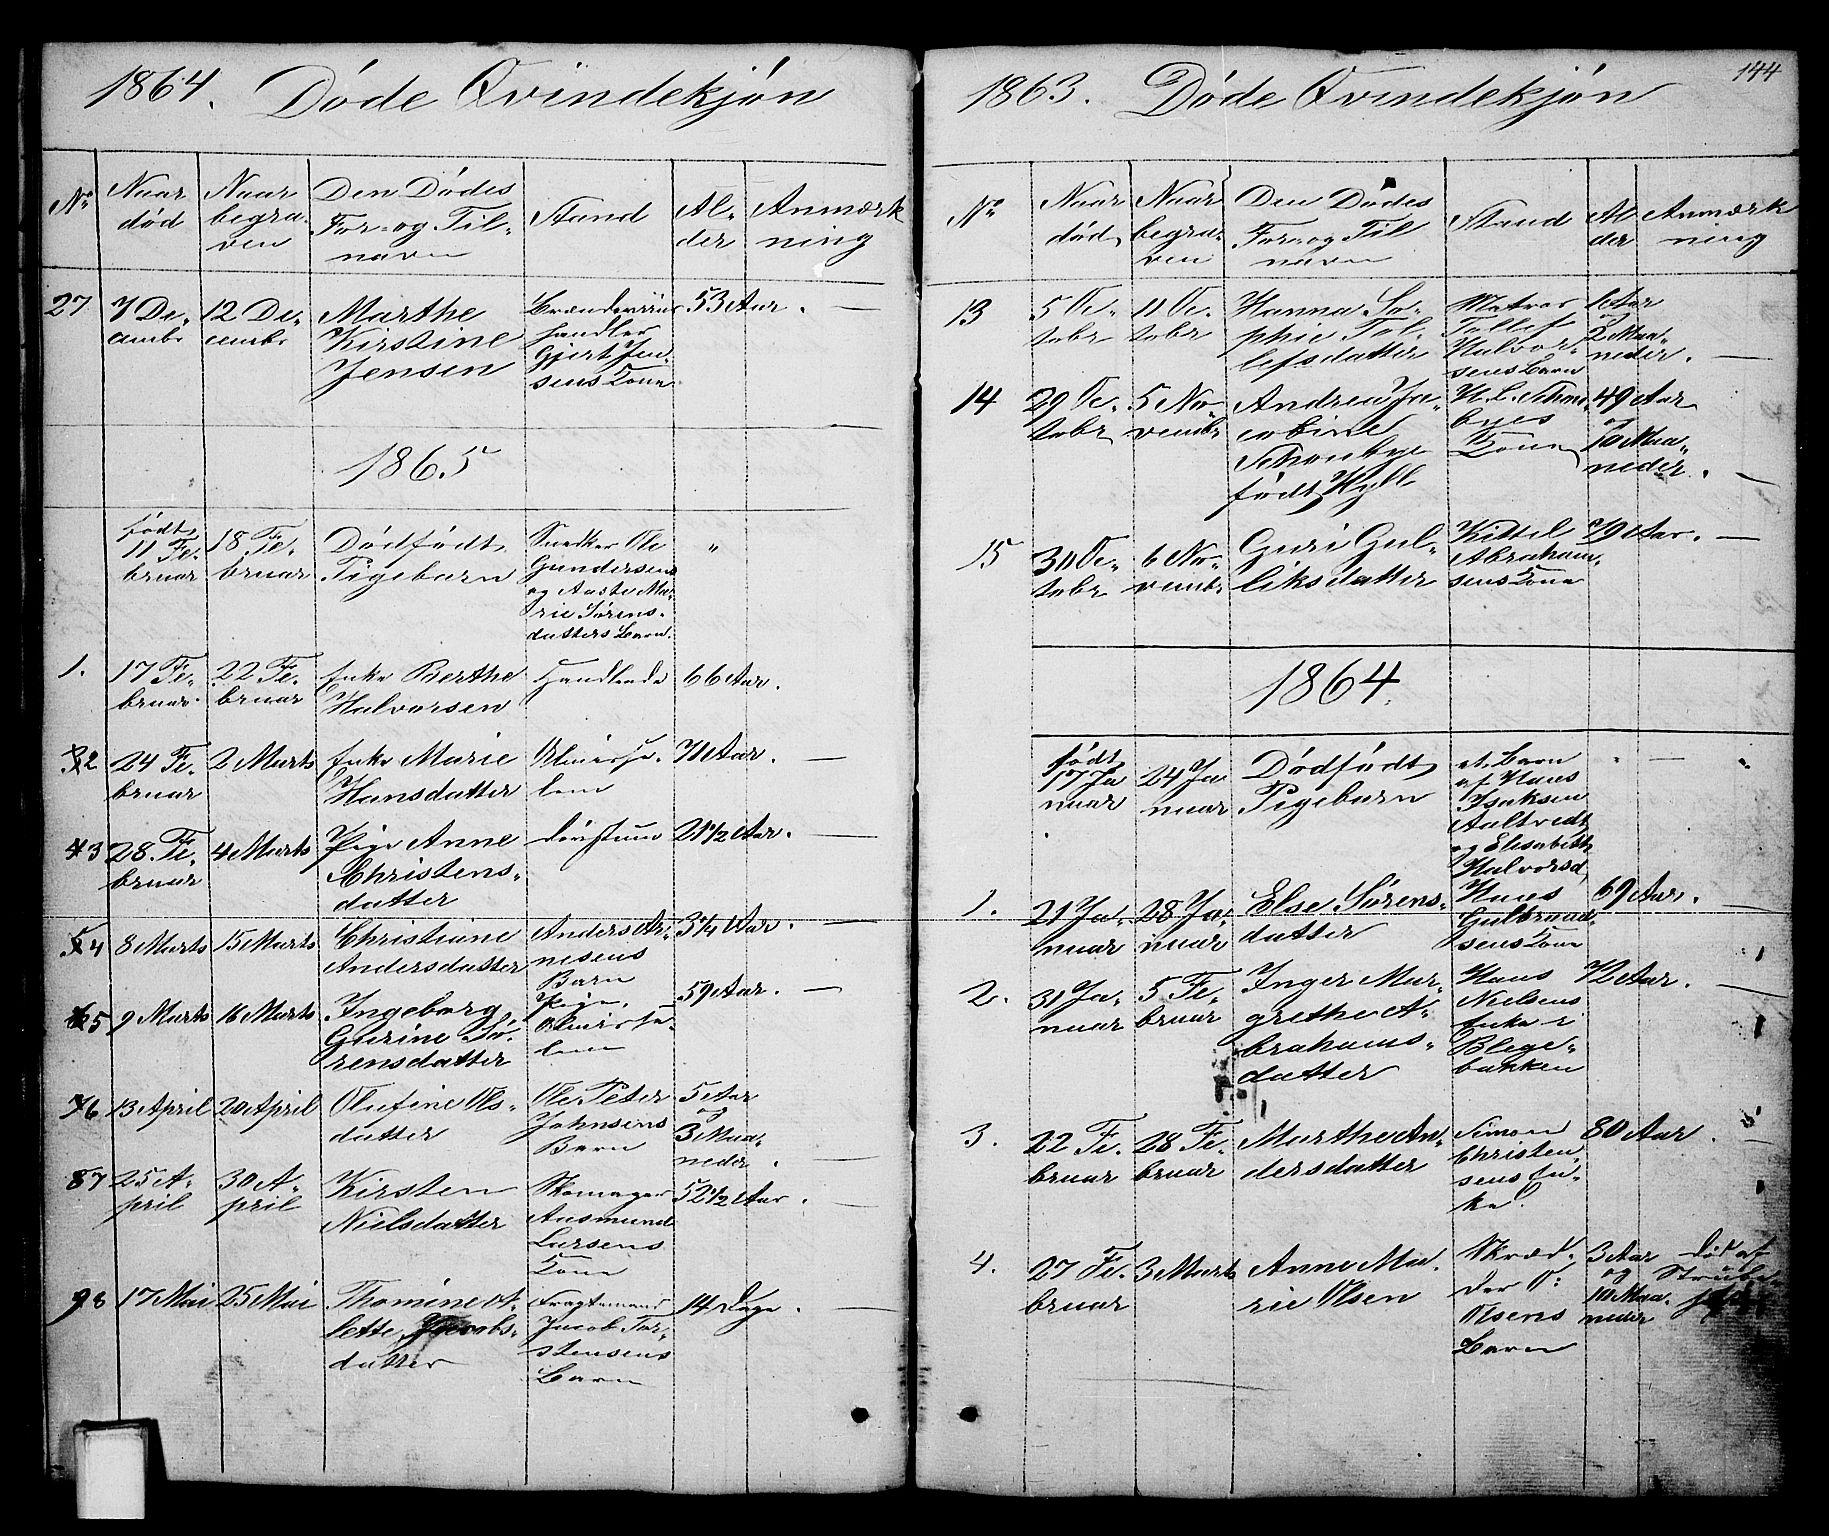 SAKO, Brevik kirkebøker, G/Ga/L0002: Klokkerbok nr. 2, 1846-1865, s. 144